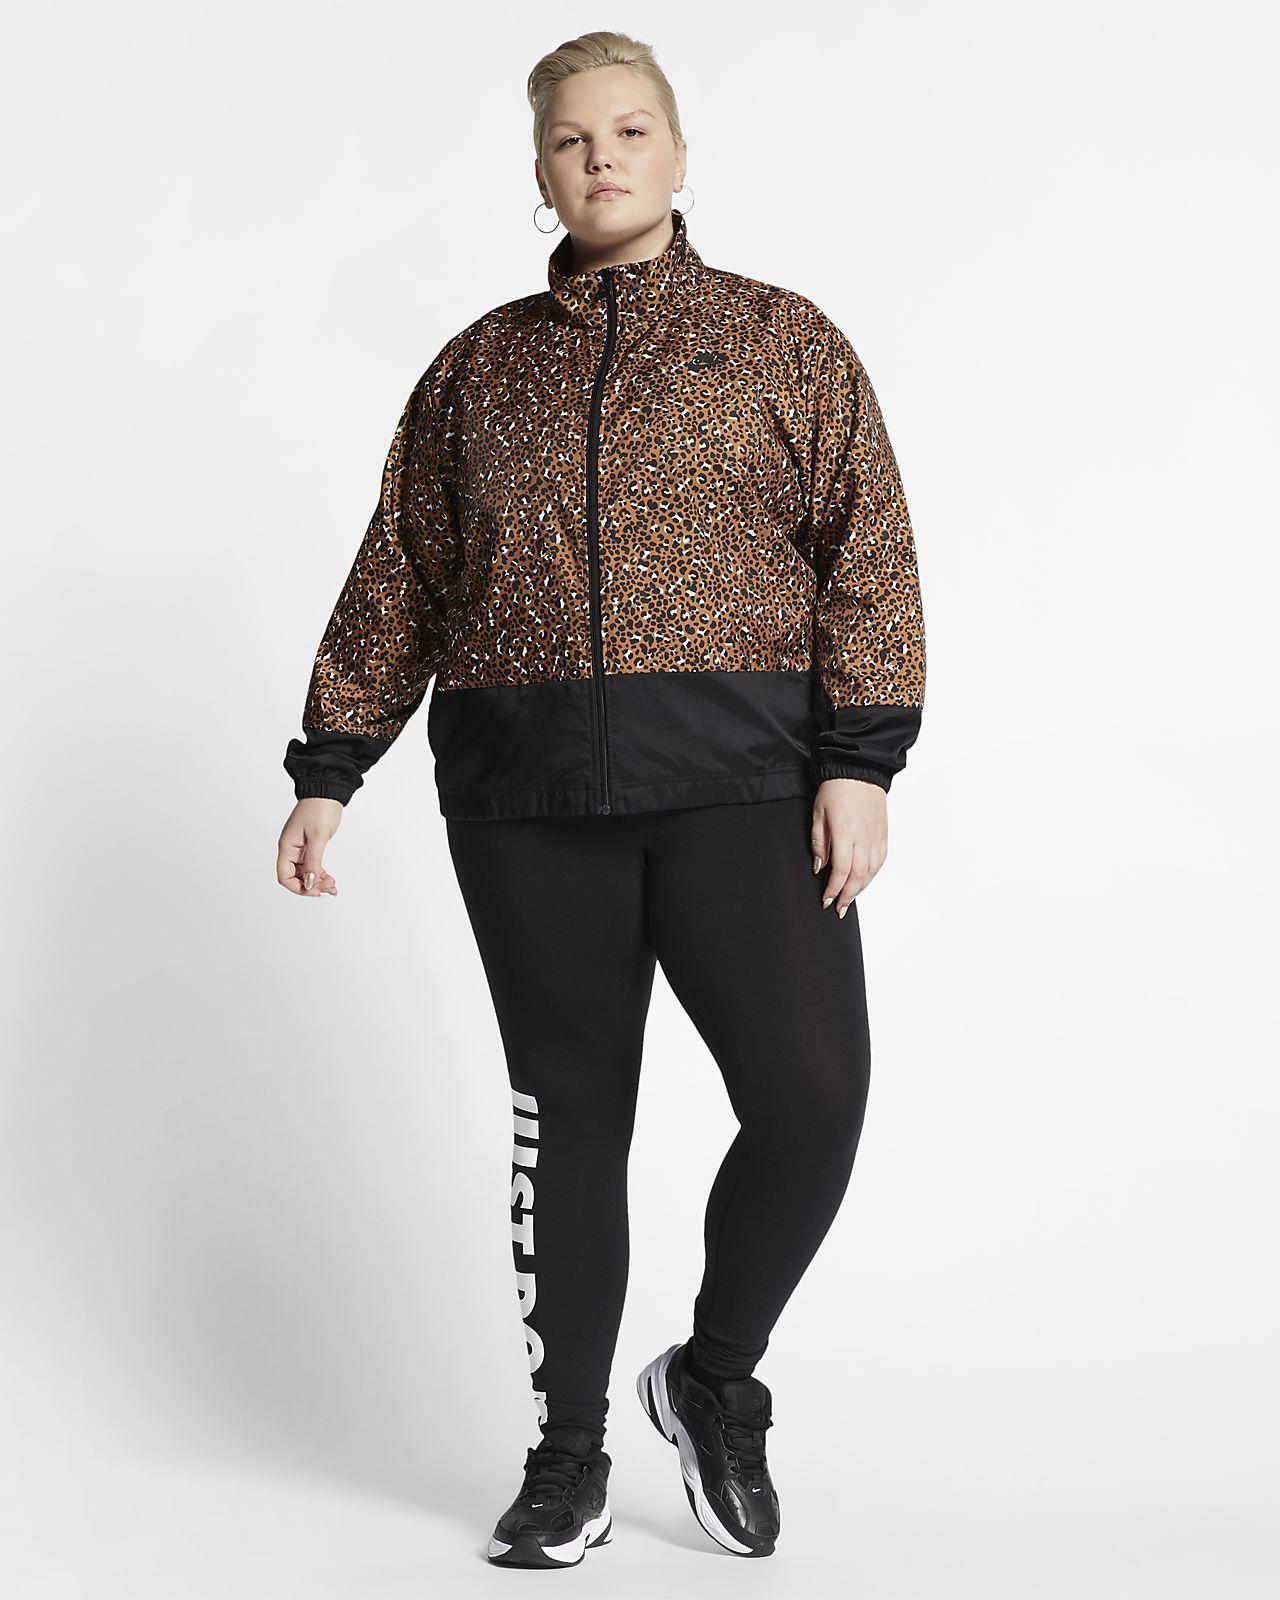 Nike Sportswear Animal Print Women's Woven Jacket (Plus Size)